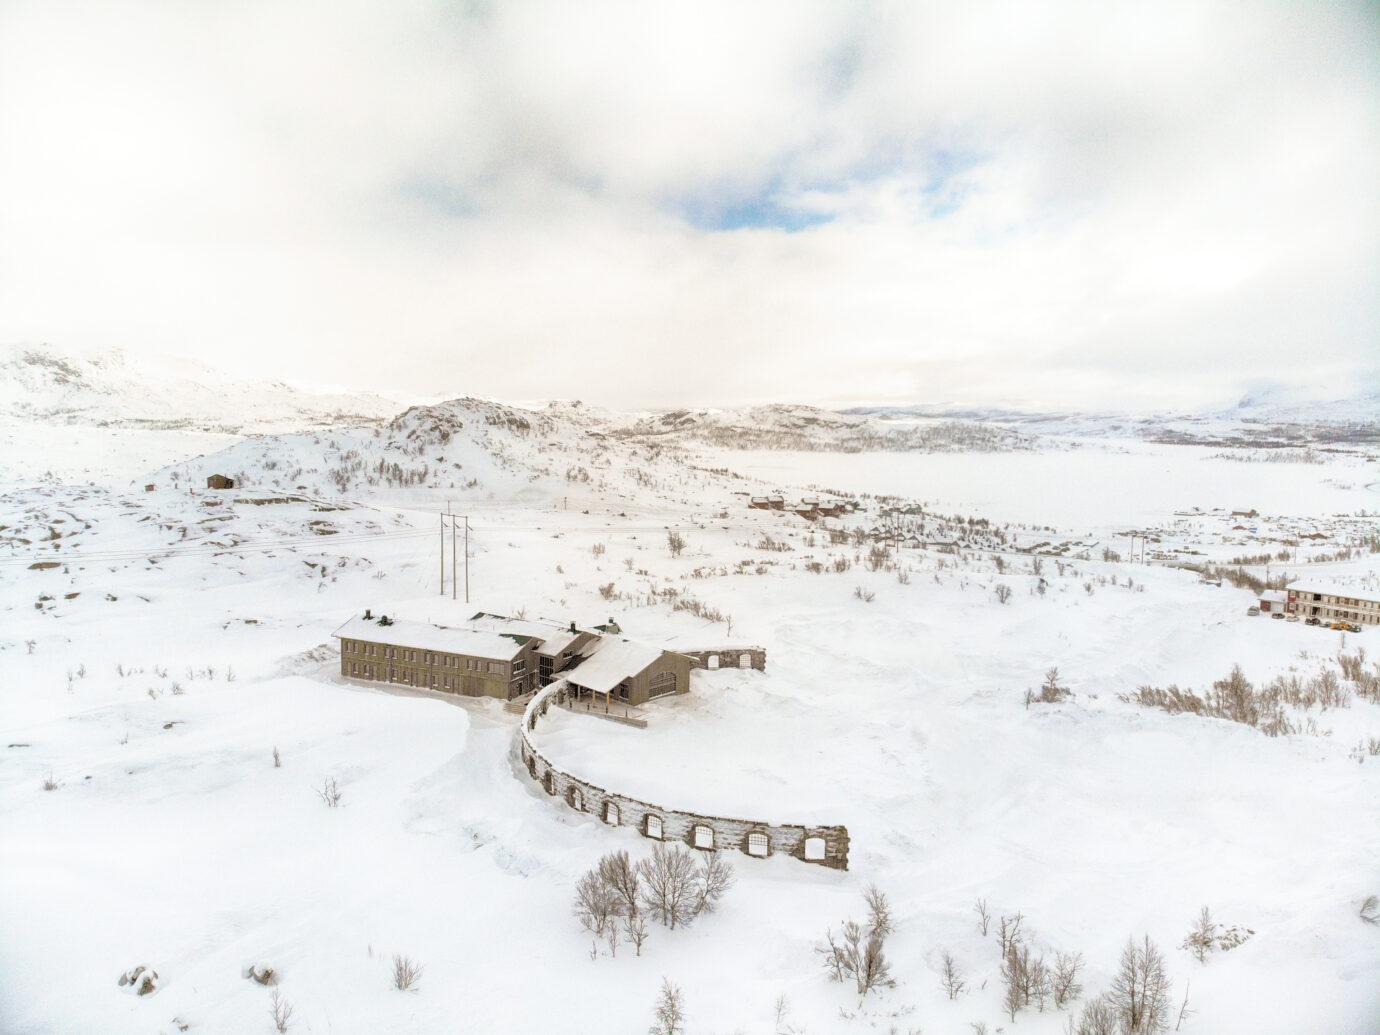 Ariel shot of Niehku Mountain Villa, Sweden